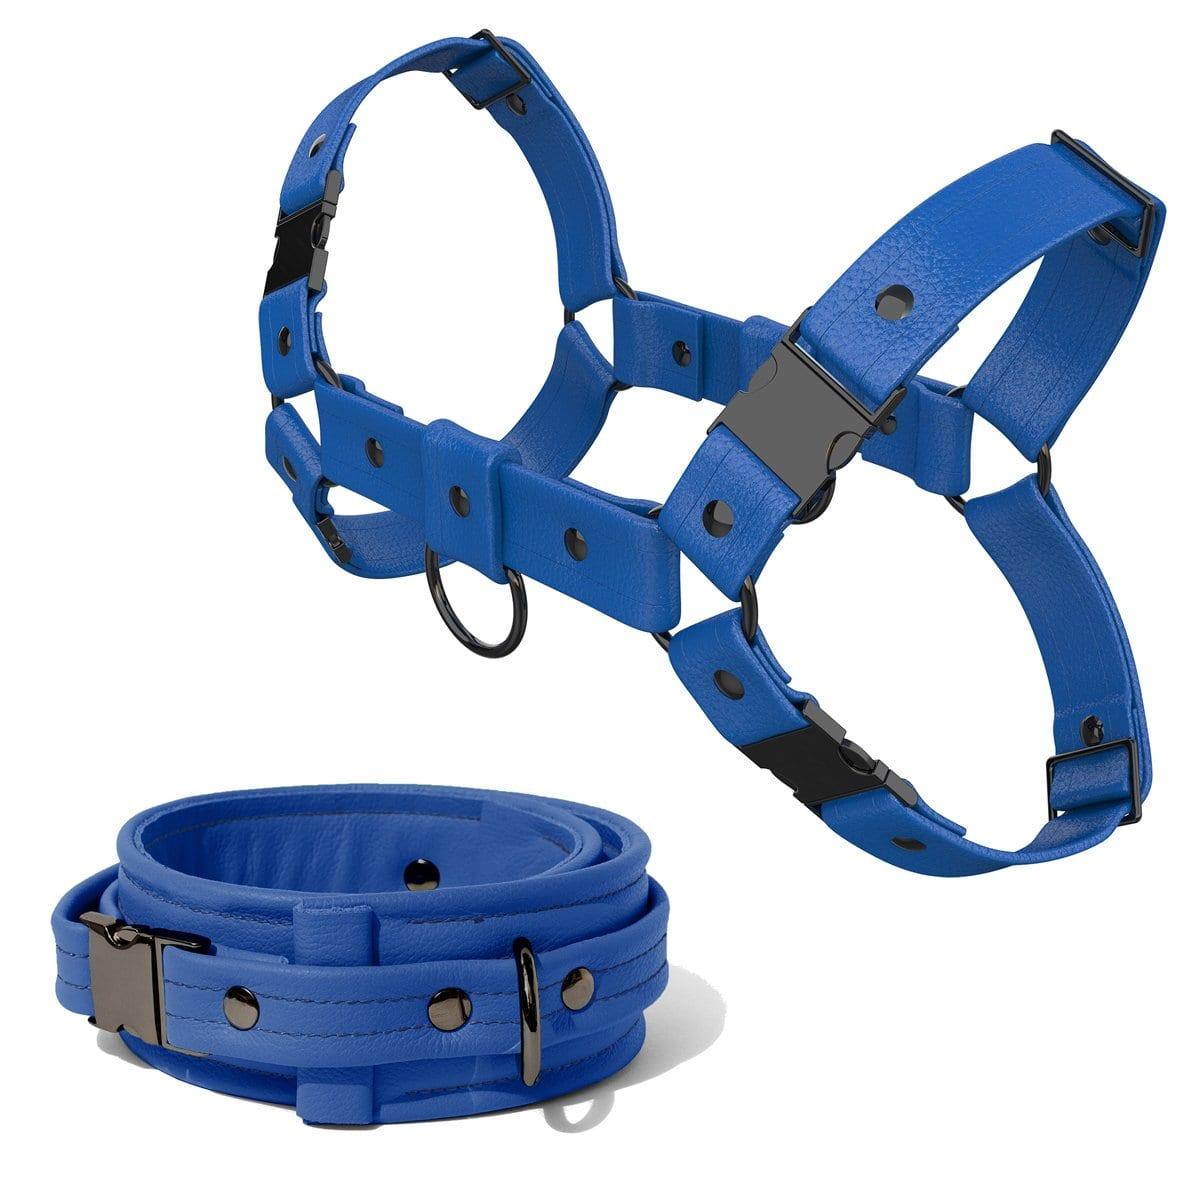 Bulldog Harness + Collar – Standard Leather – Blue - Gun Metal Black Fittings